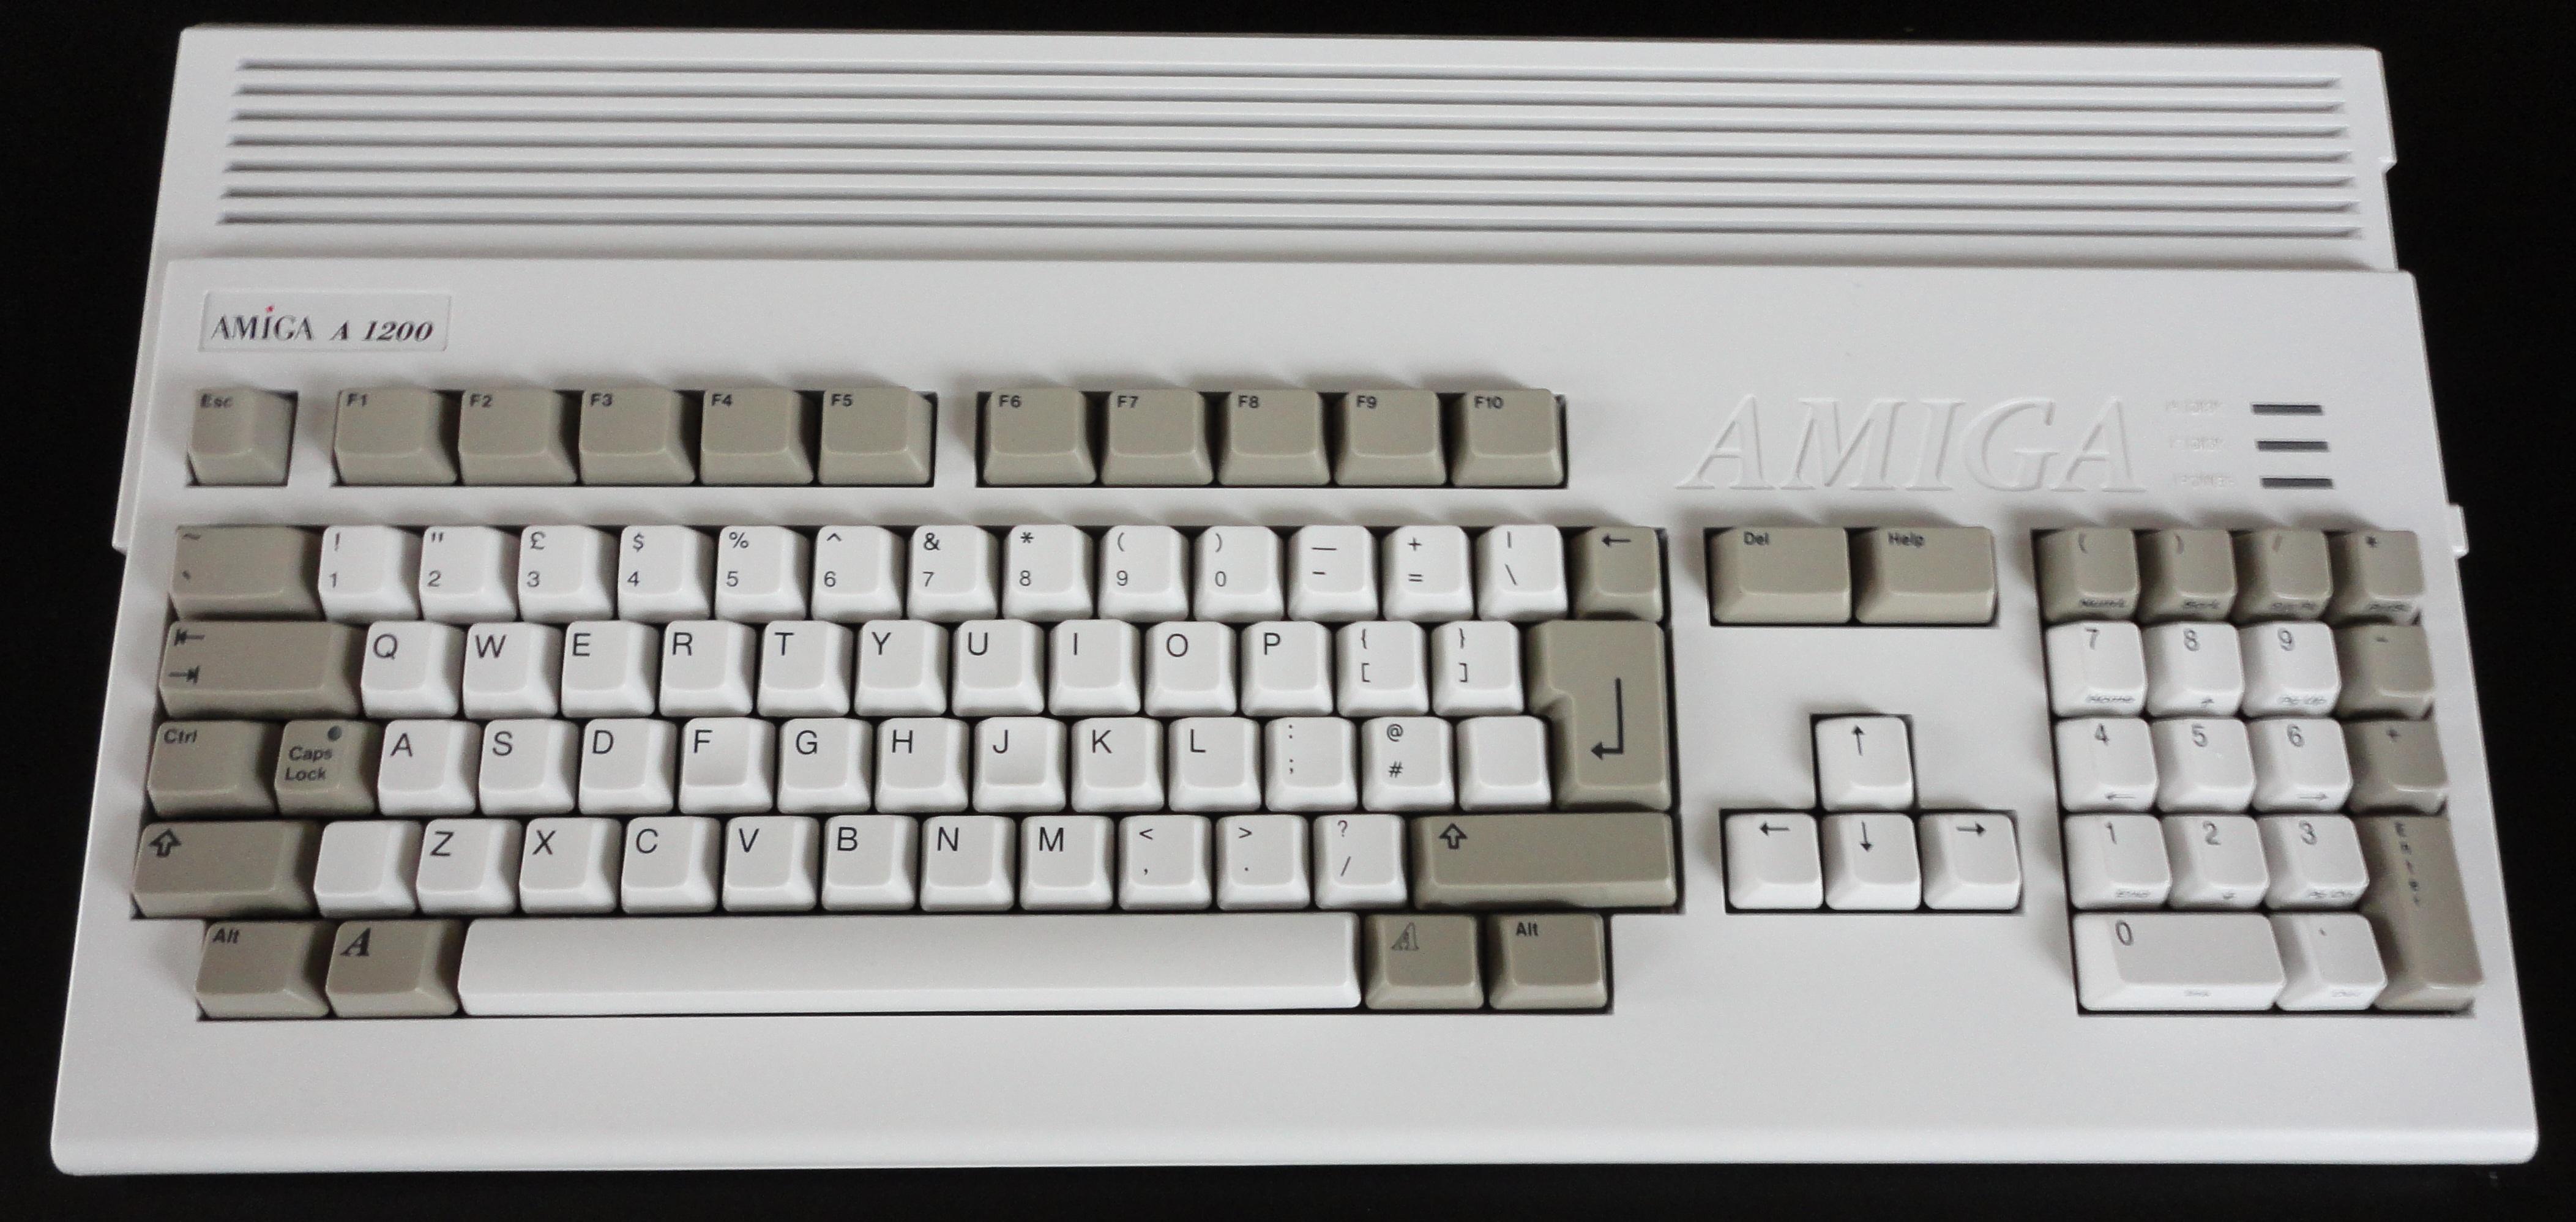 High Resolution Wallpaper | Commodore Amiga 4209x1997 px